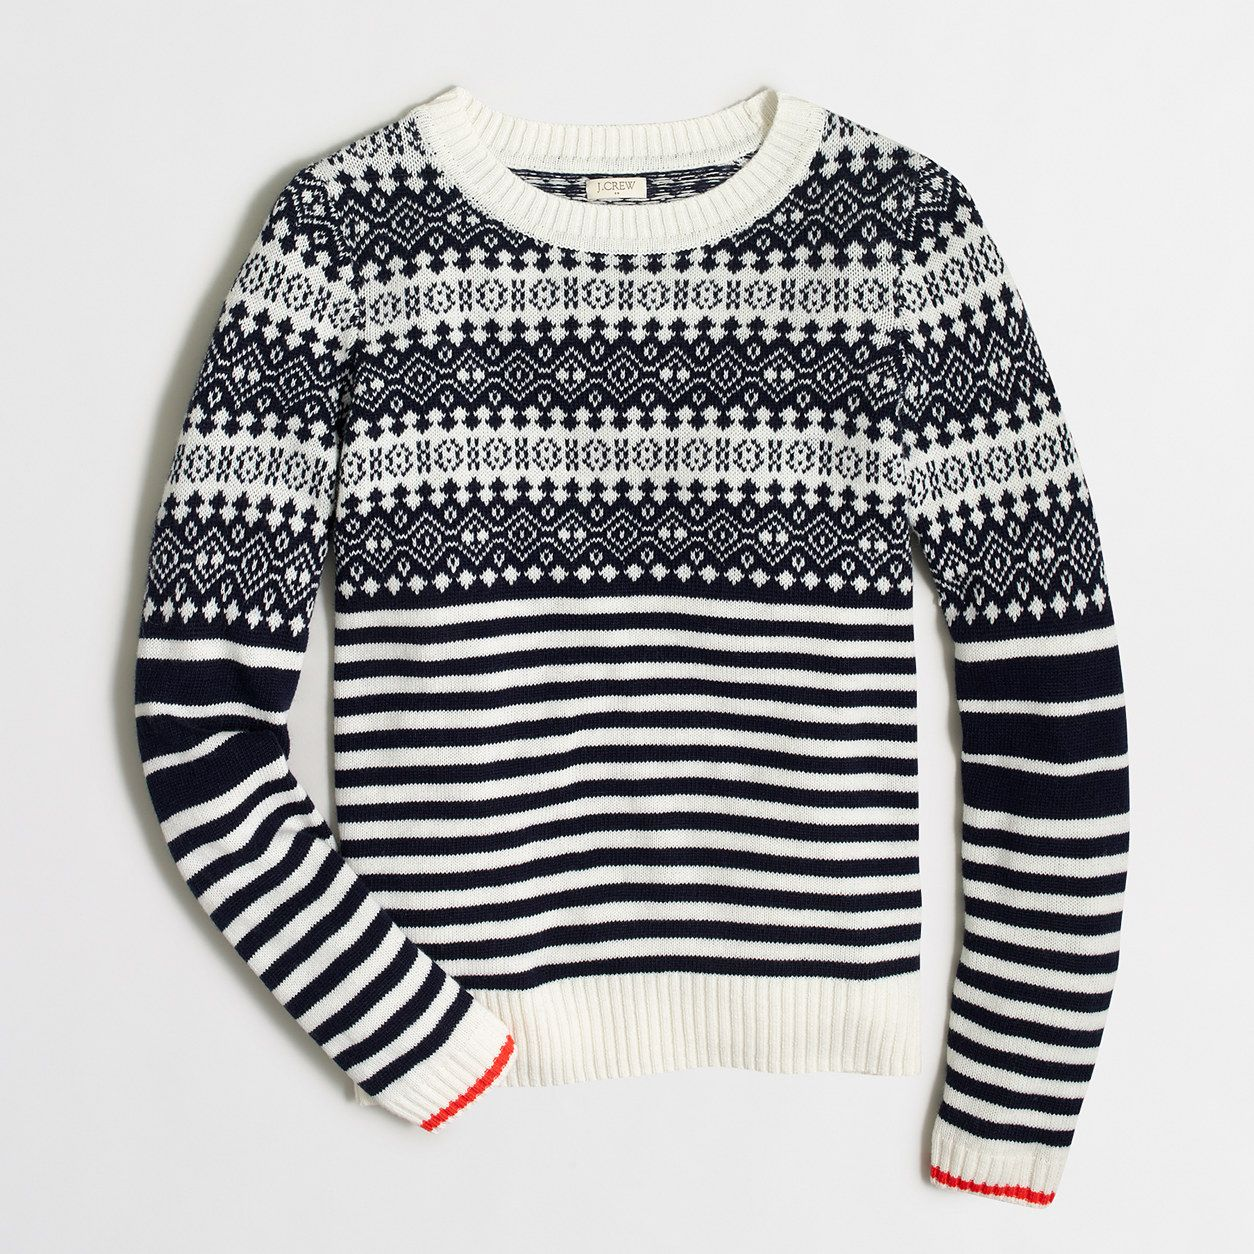 Factory Fair Isle sweater with stripes : crewnecks & boatnecks | J ...